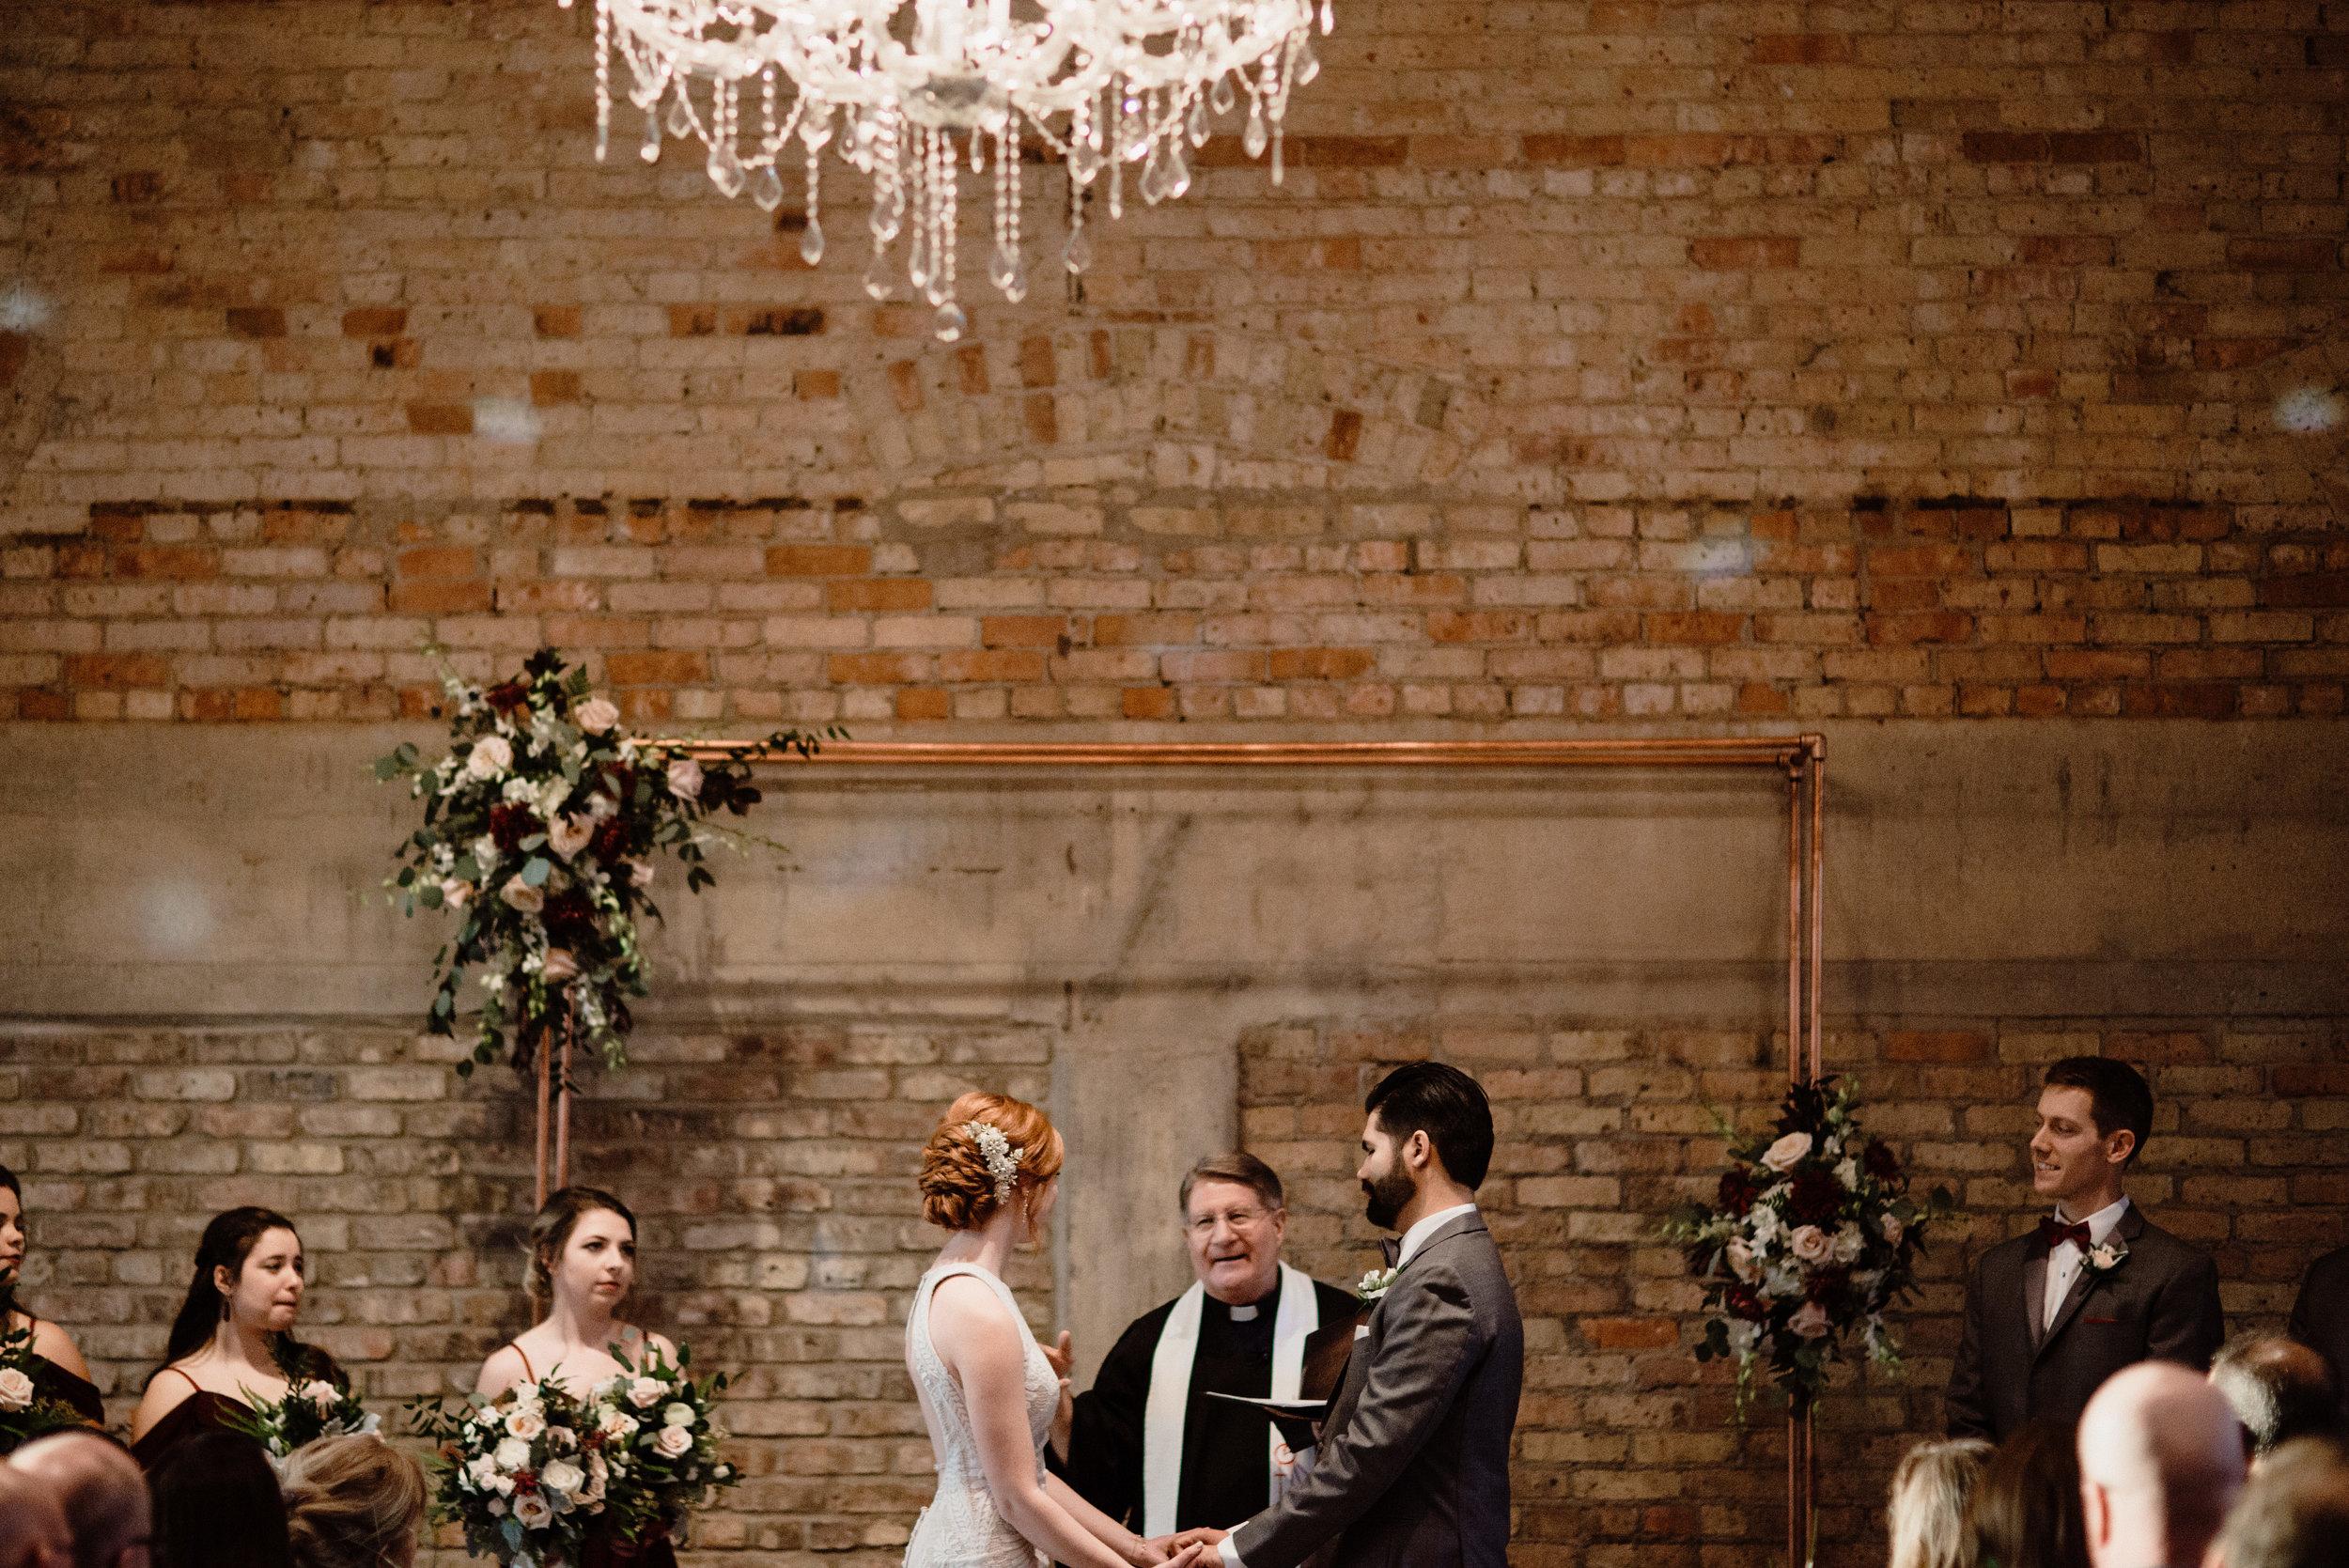 The Brix on Fox, Chicago Wedding Photographer, Zach and Rosalie00058.jpg